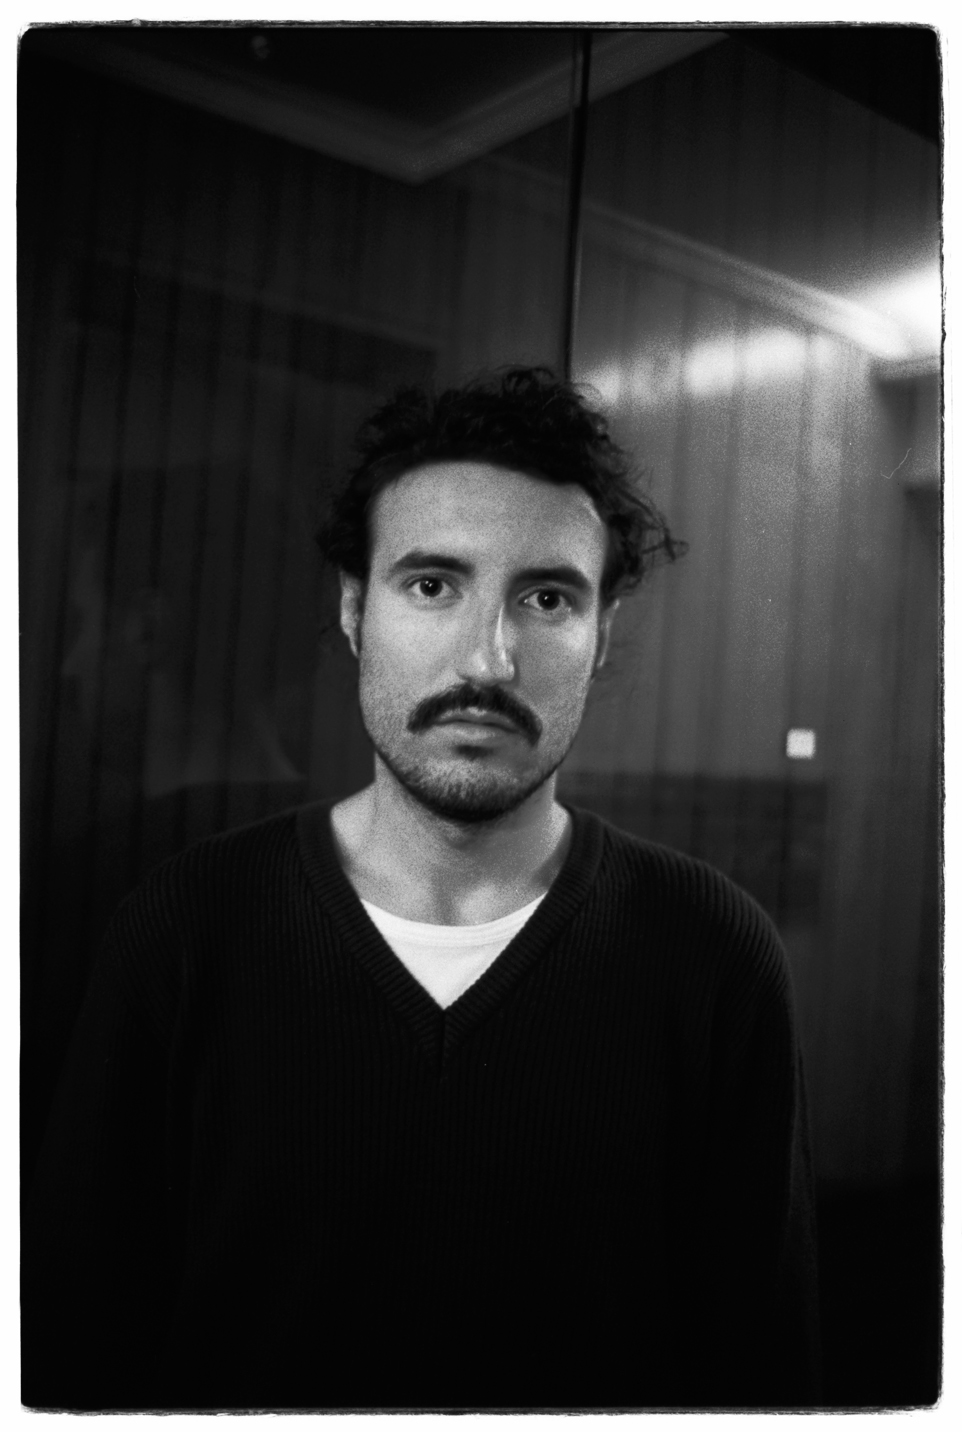 1_Marco Rambaldi foto.JPG